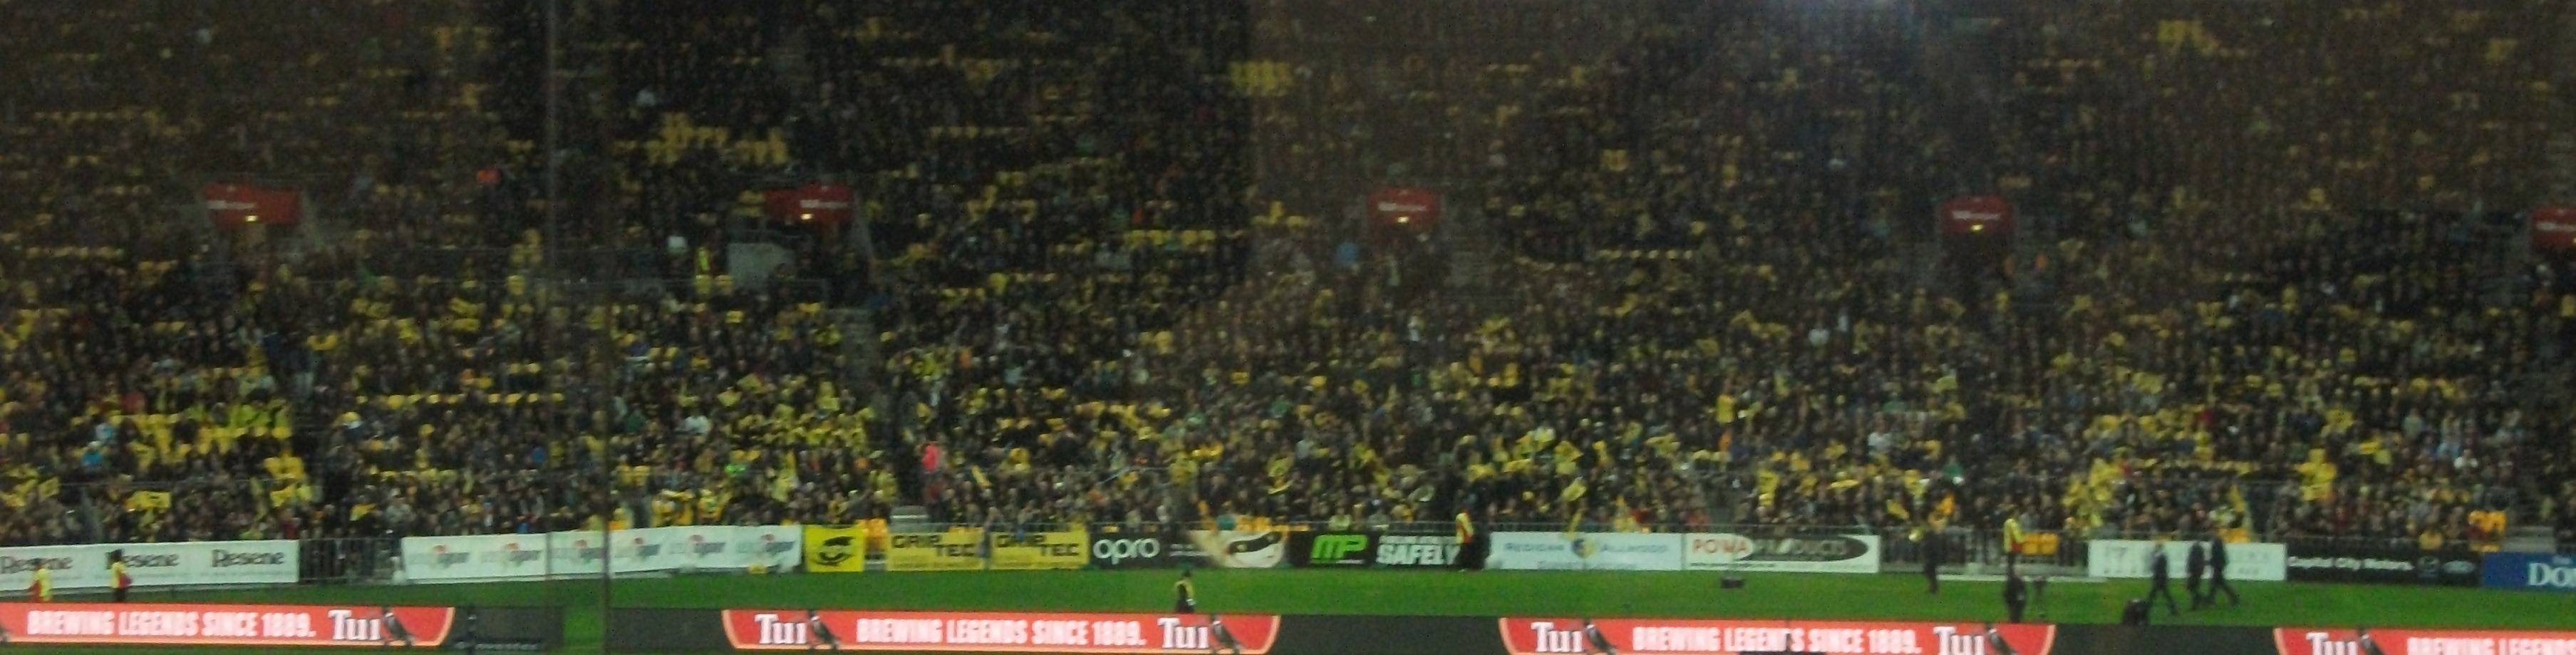 Dortmund Wellington